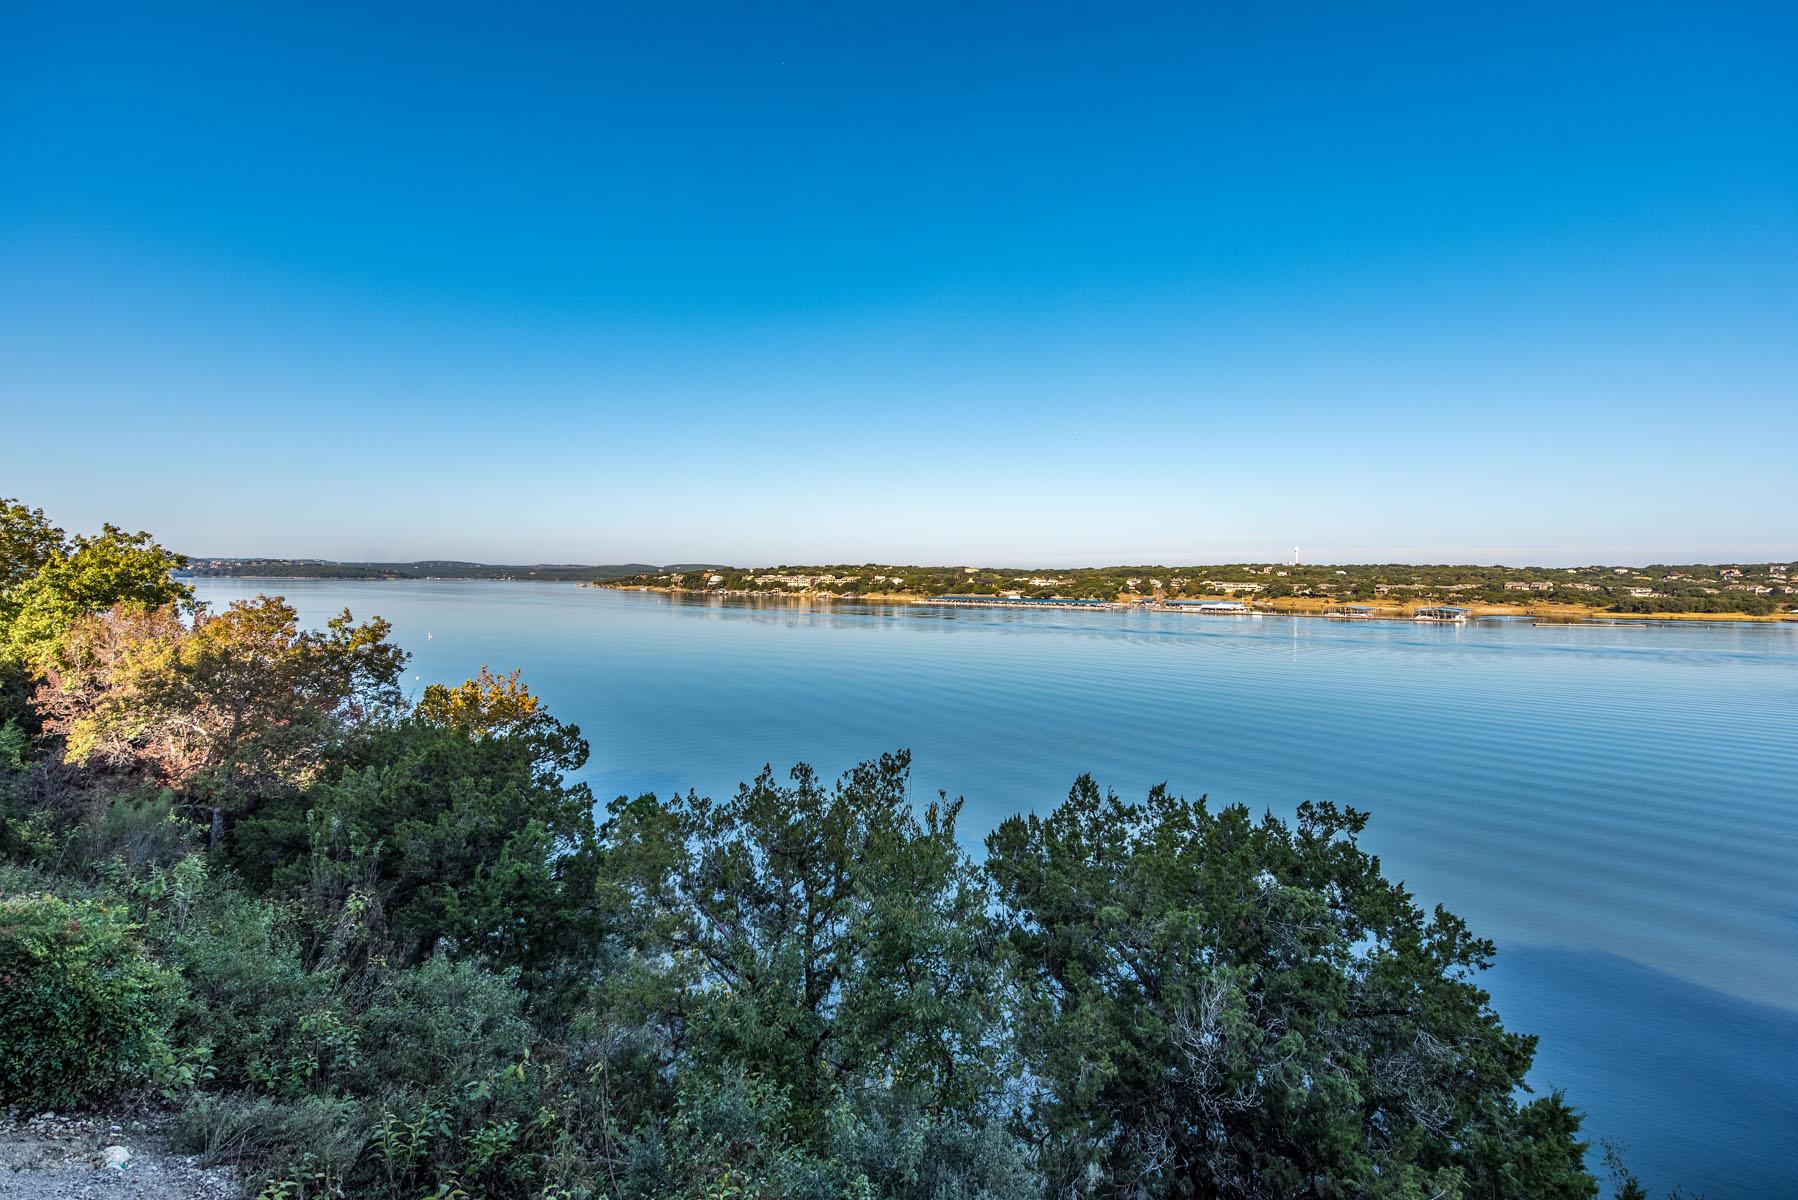 Condominium for Sale at Waterfront Views on Lake Travis 112 Marina Village Cv 112 Austin, Texas 78734 United States